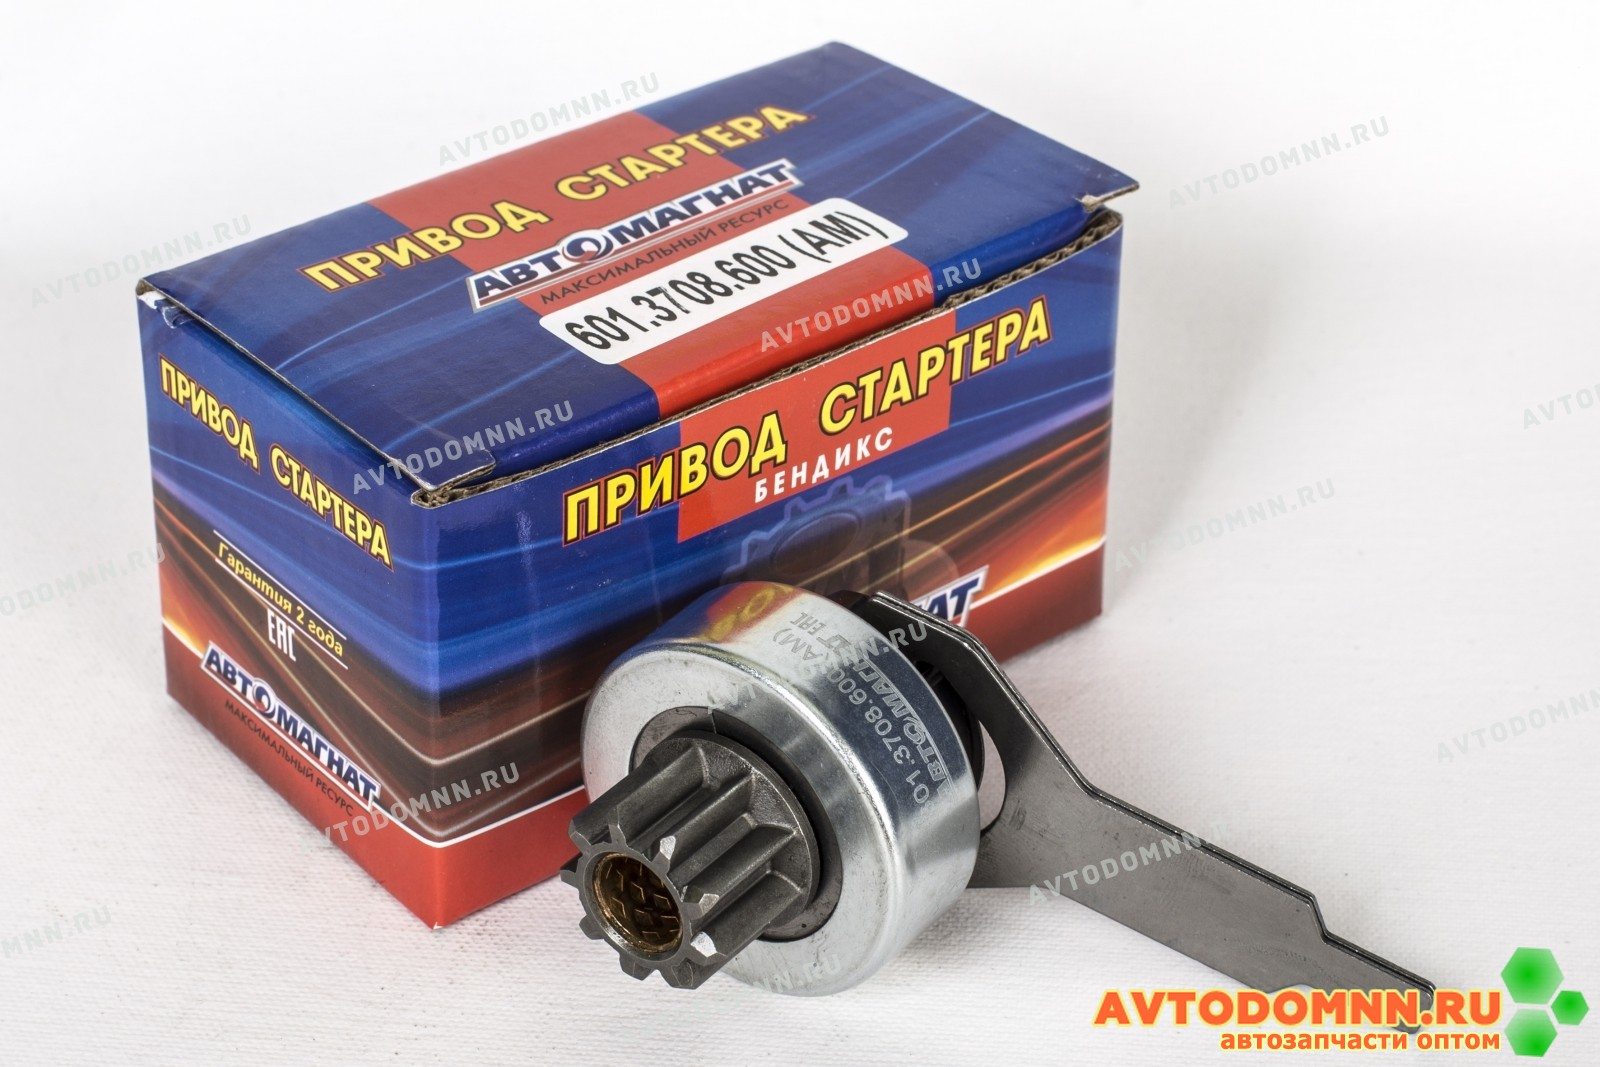 601.3708.600 привод Г, УАЗ с двигателем ЗМЗ 405, 406, 409, для стартера 6012.3708 (XH-023)